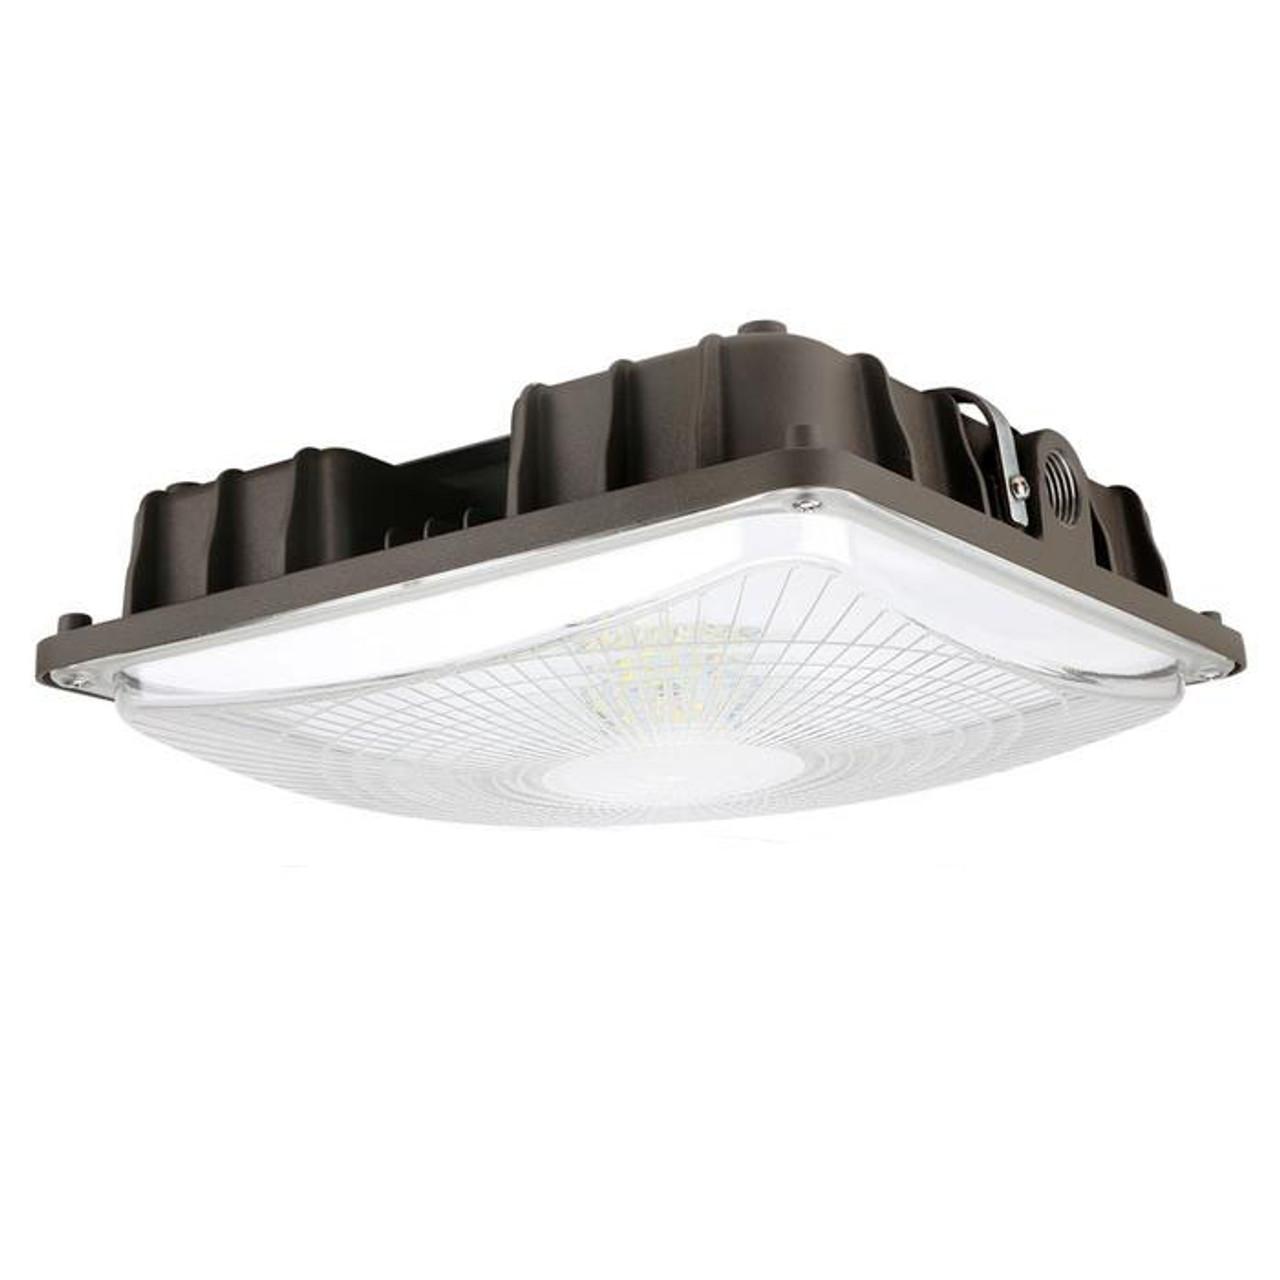 27 Watt LED Canopy Light